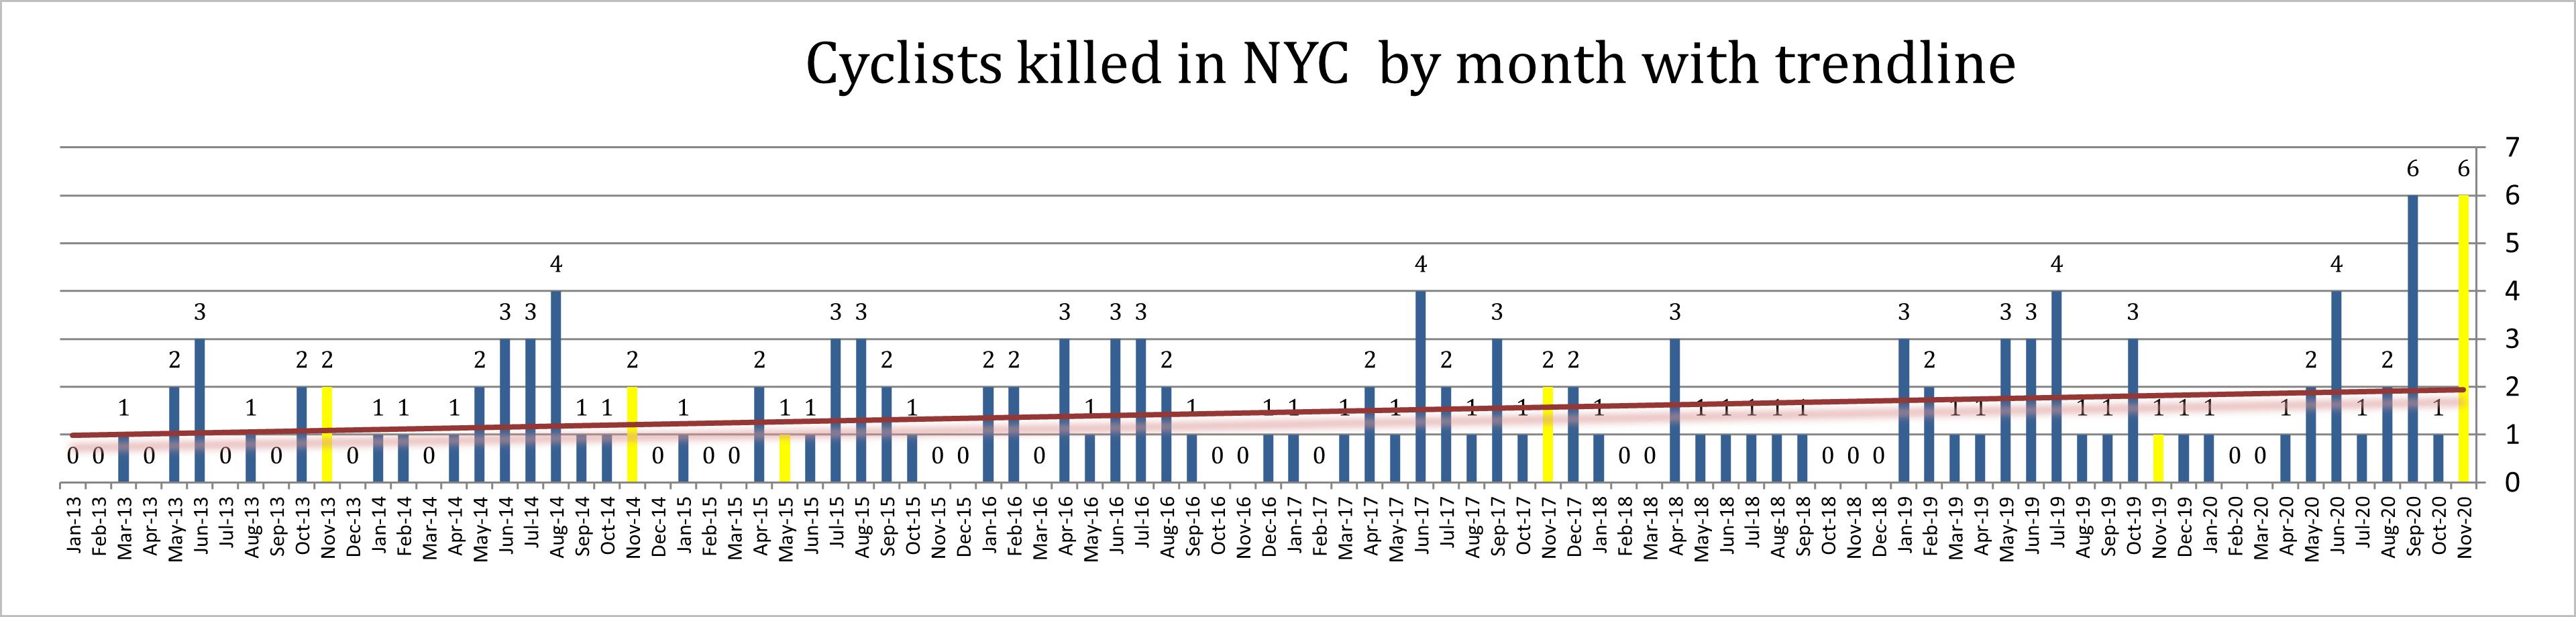 Bicyclist deaths New York November 2020